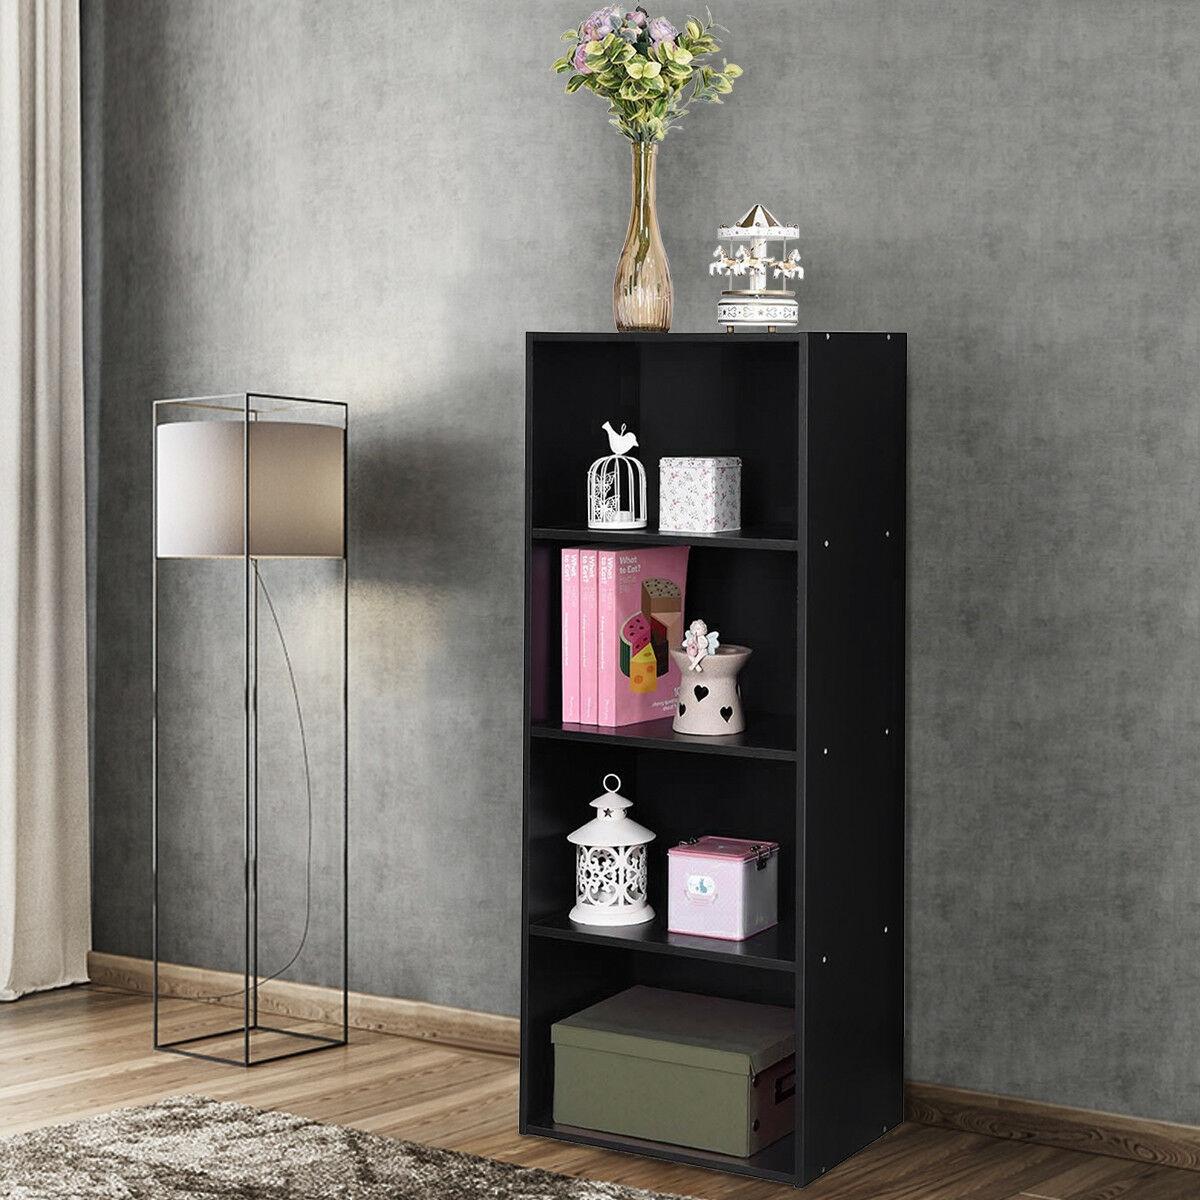 4 Tier Open Shelf  Storage Display Cabinet